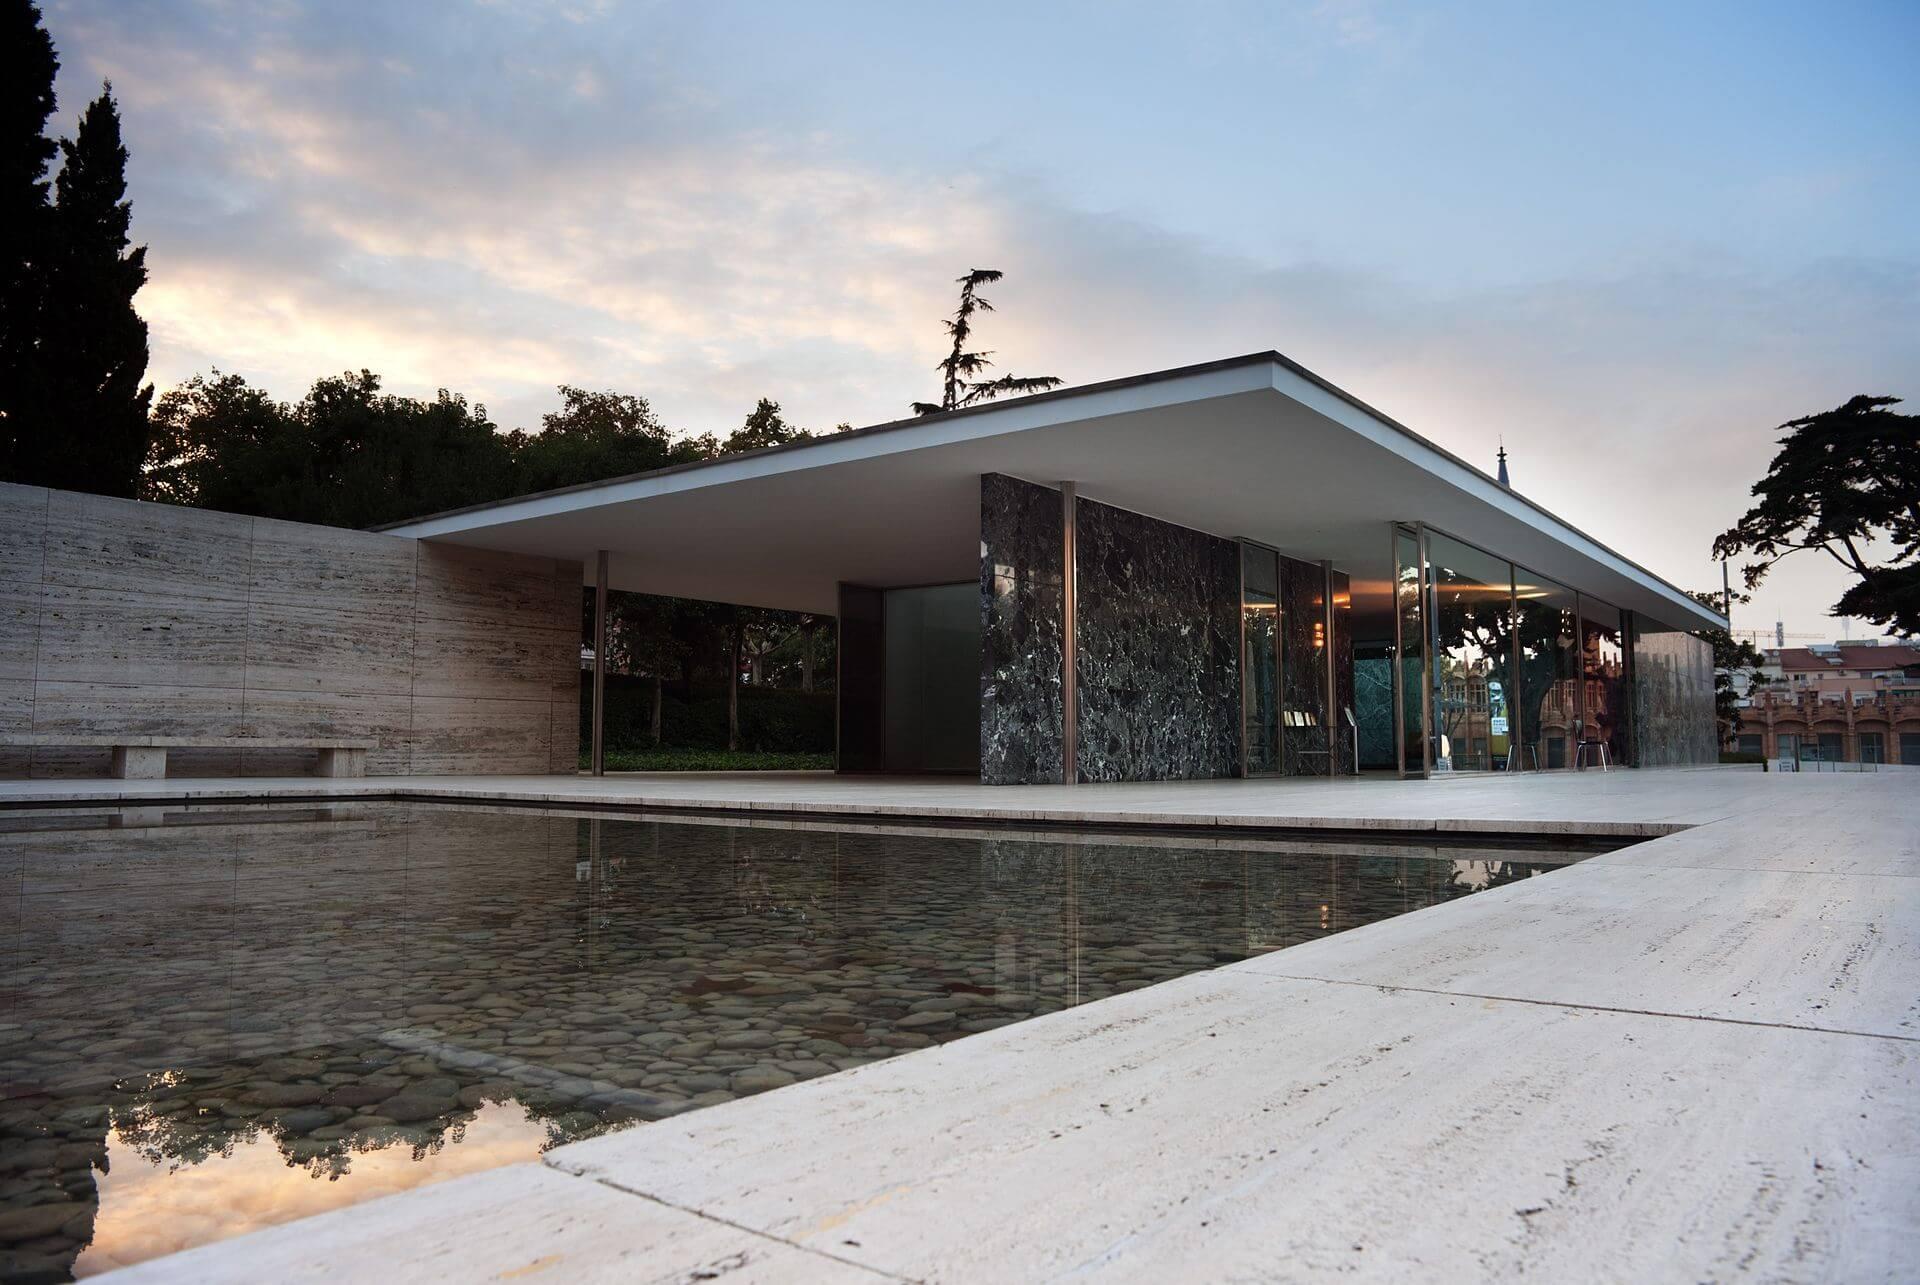 Barcelona Pavilion designed by Ludwig Mies van